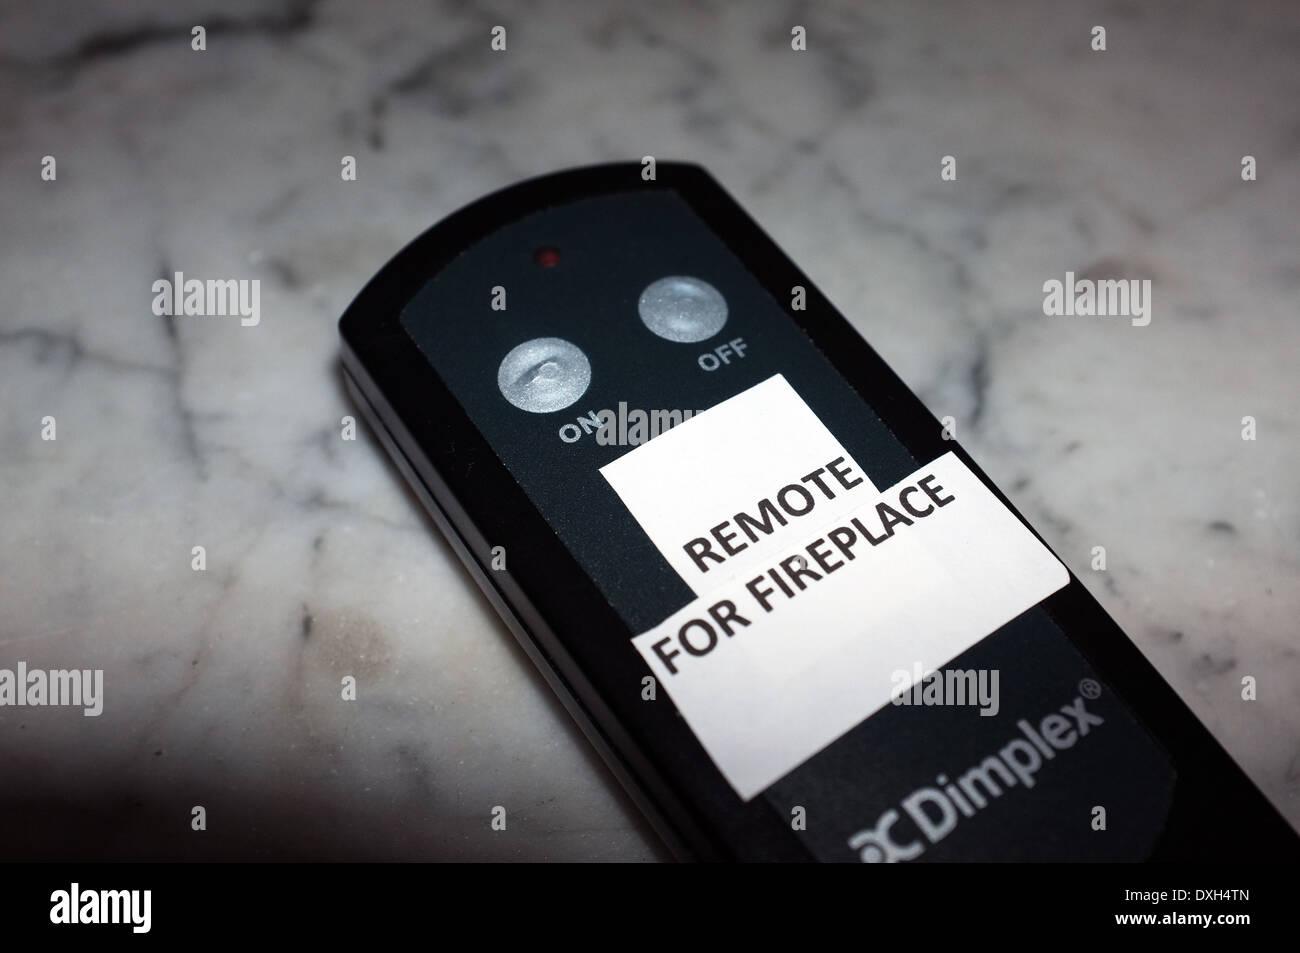 Electric Fireplace Stockfotos & Electric Fireplace Bilder - Alamy